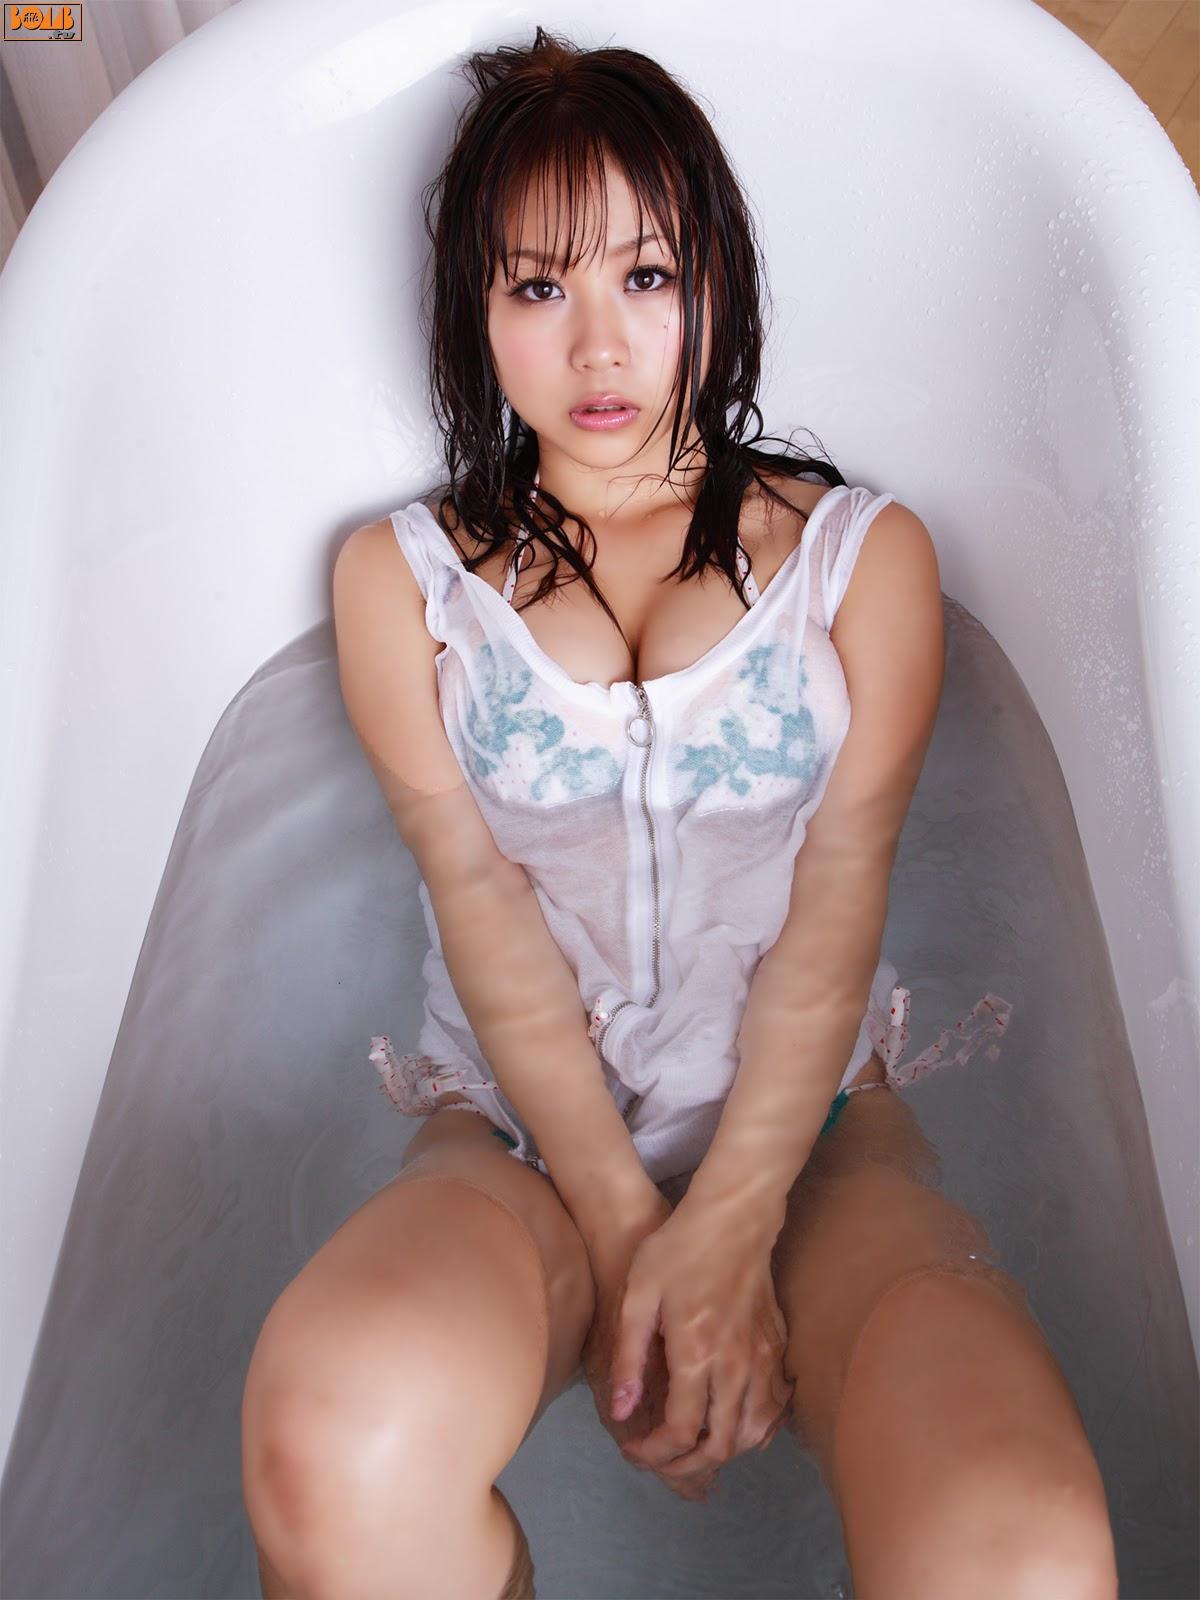 New Age Gravure Steamer Reason why it flowed in the wet bathroom Mai Nishida017